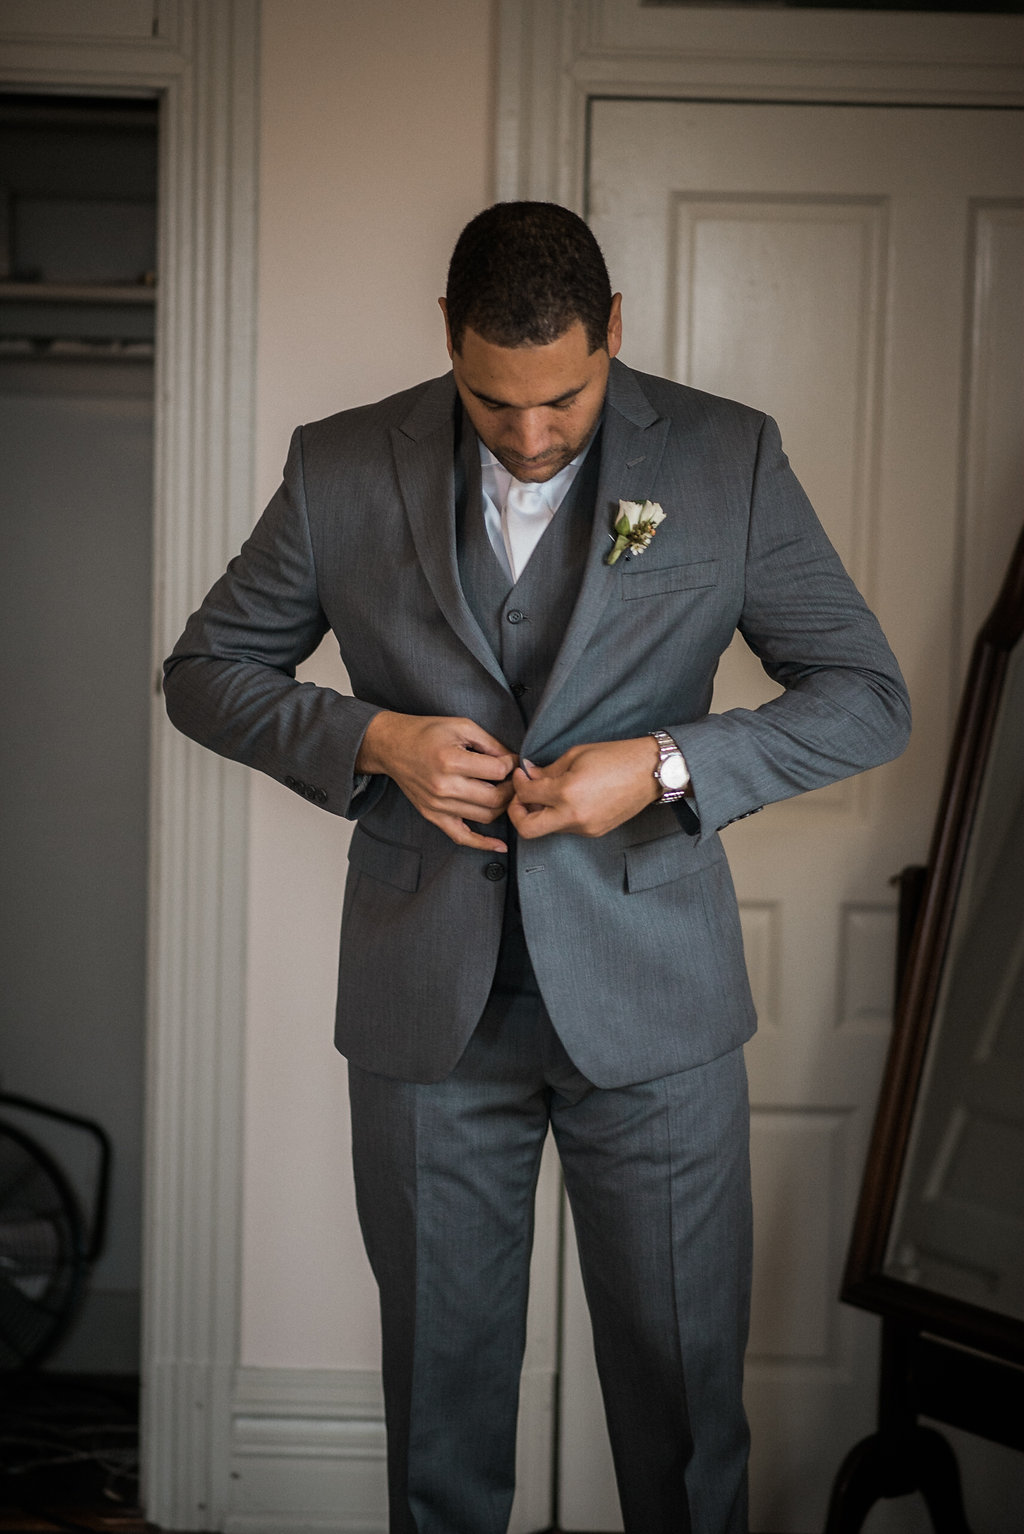 groomsmen getting ready wedding photo